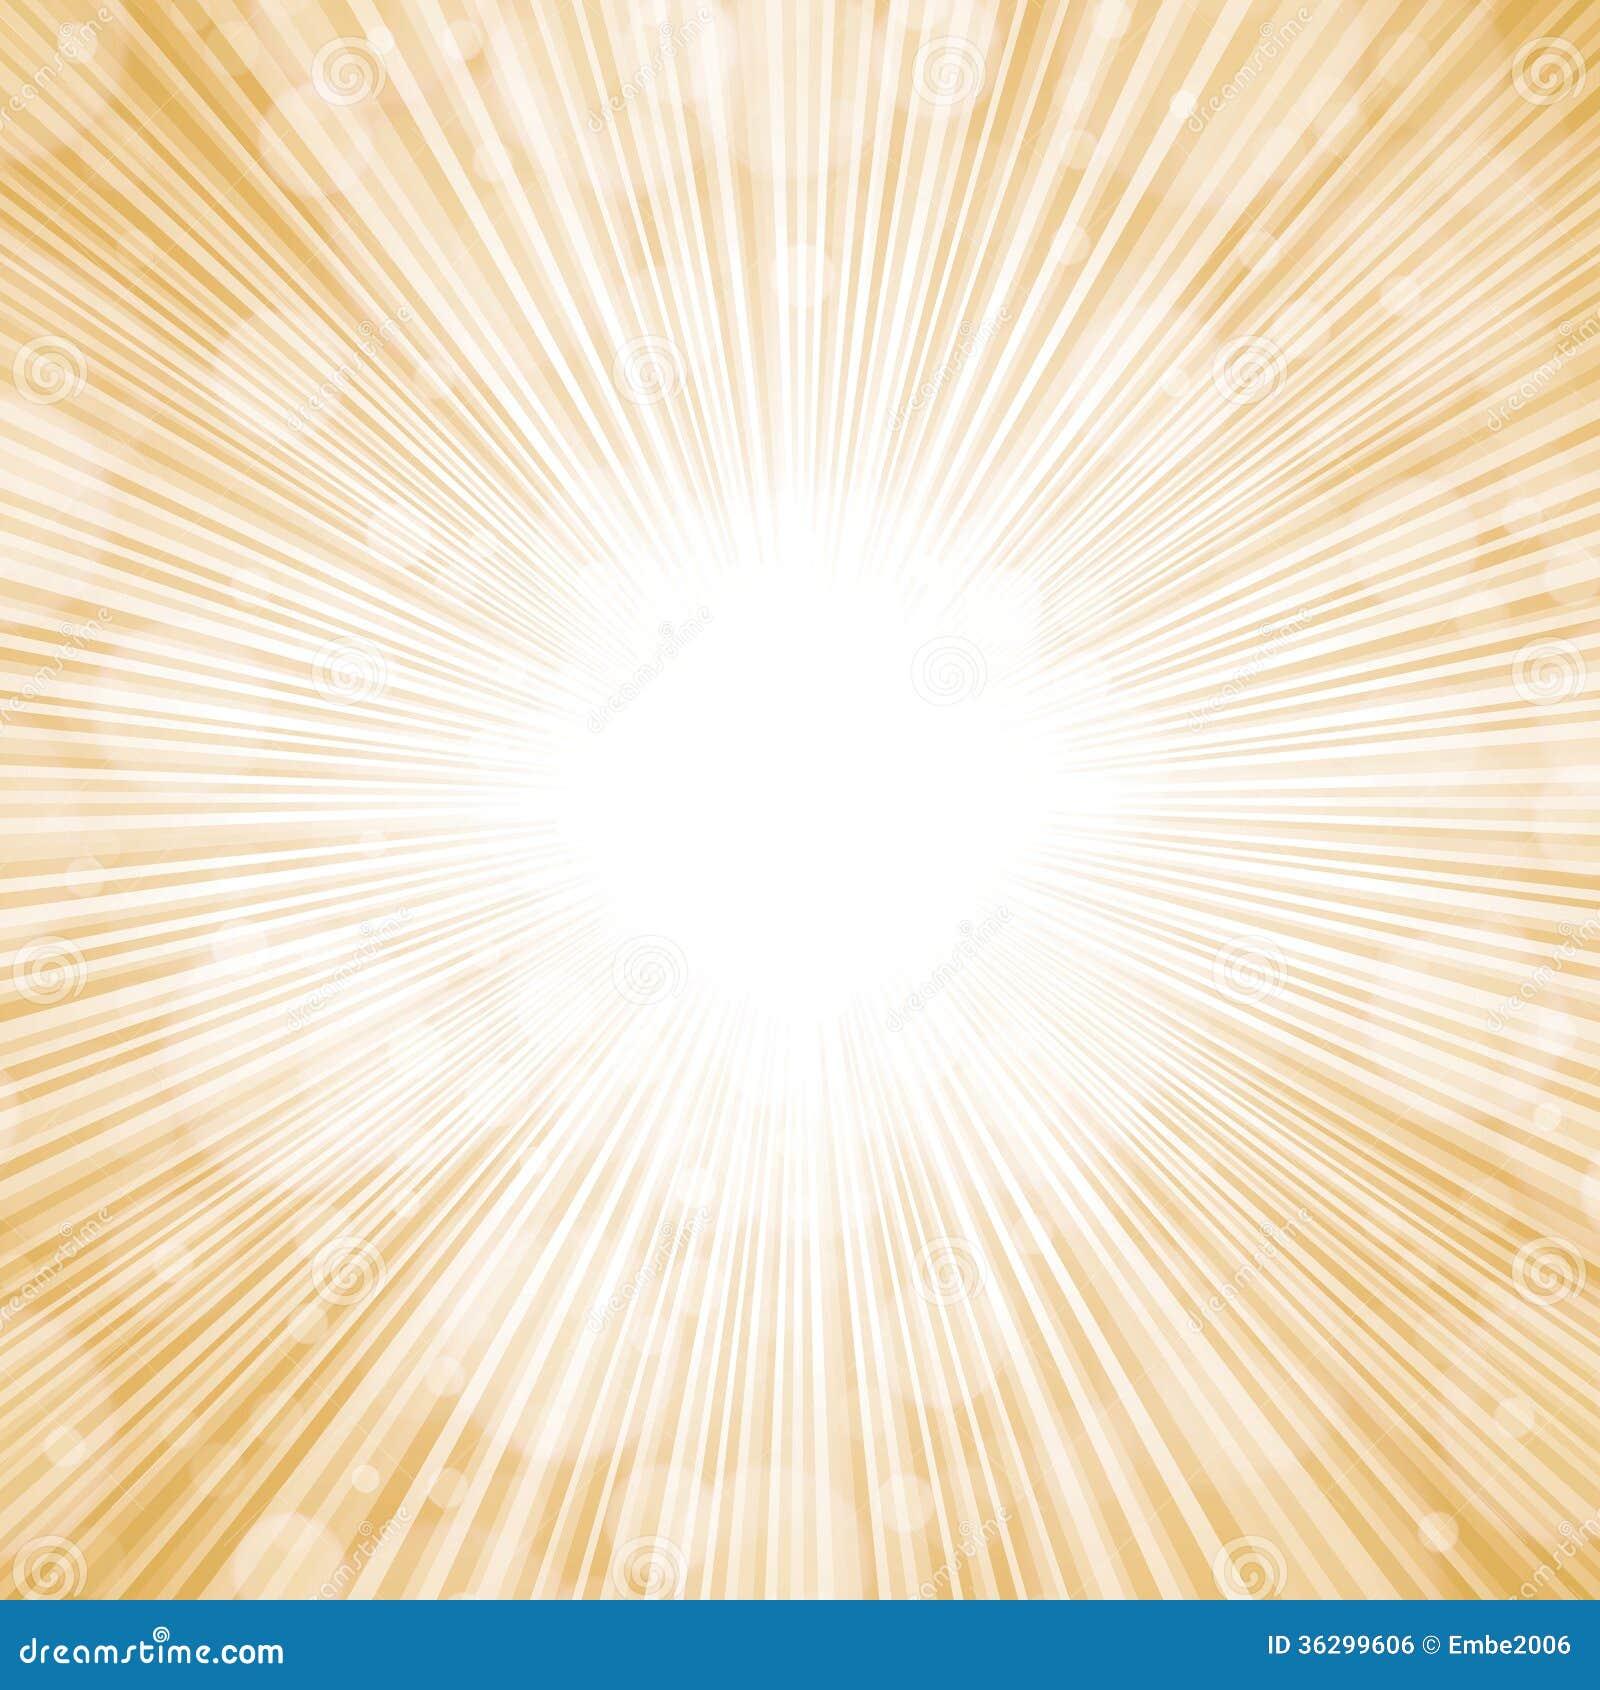 Golden Lights Background Stock Vector Image Of Easy